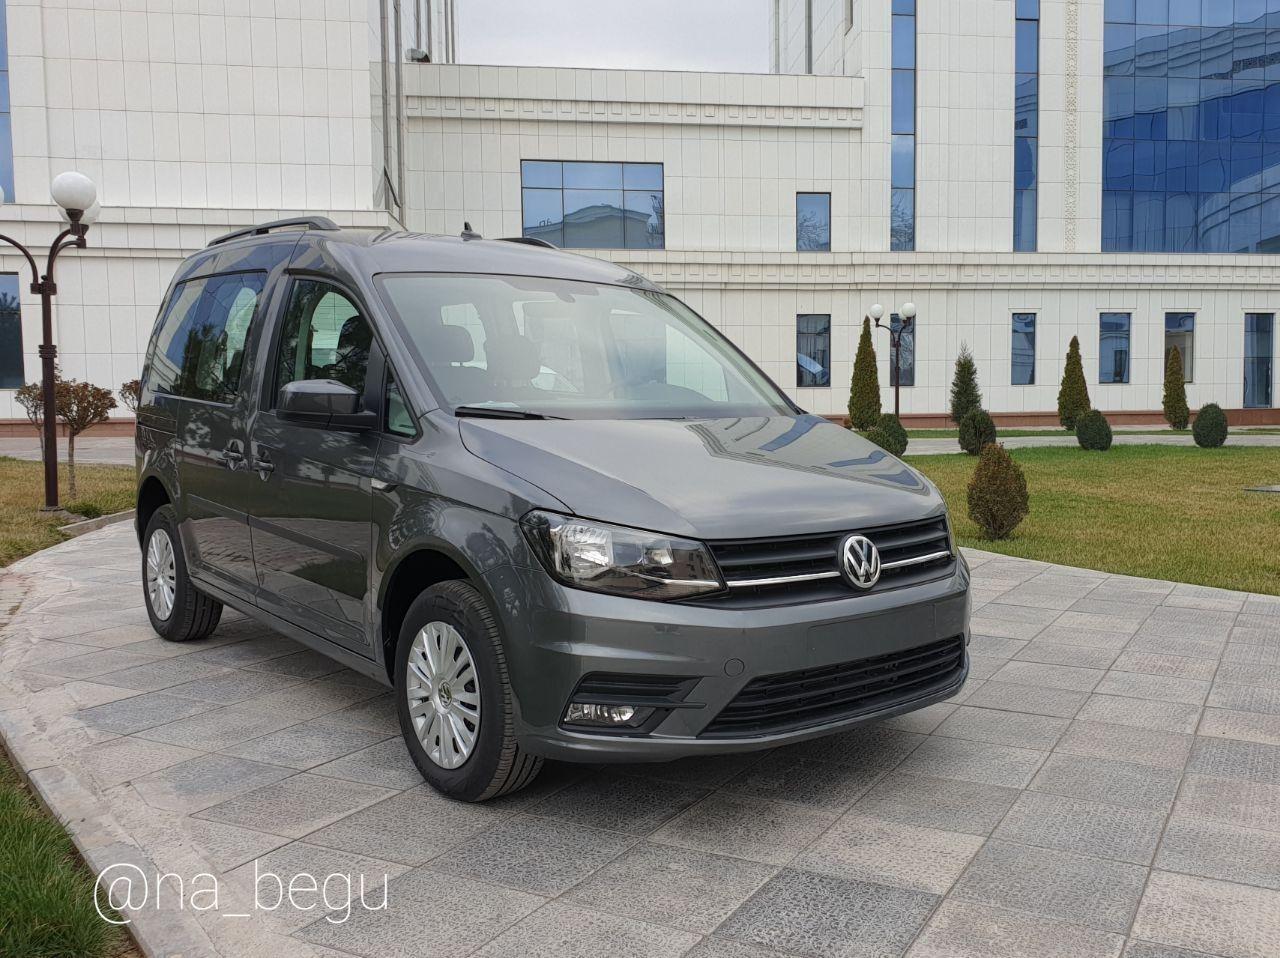 Volkswagen Caddy Narxi - Цена на Кэдди в Узбекистане - 11